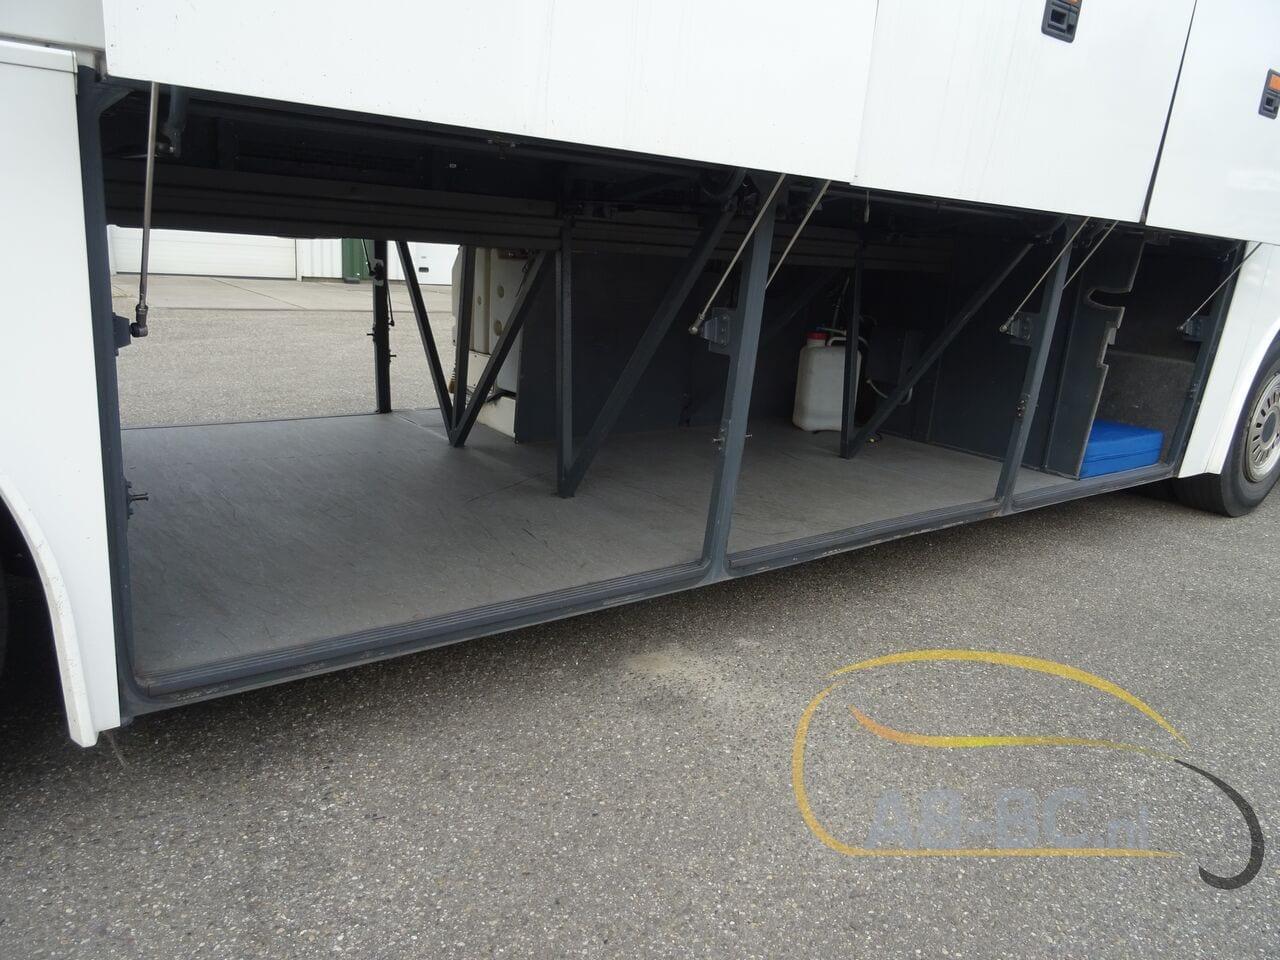 coach-busTEMSA-Safari-HD-51-Seats-EURO5-12-MTR---1614266402716615758_big_854367962364c075dd125b0842c9678c--19052917224730818200